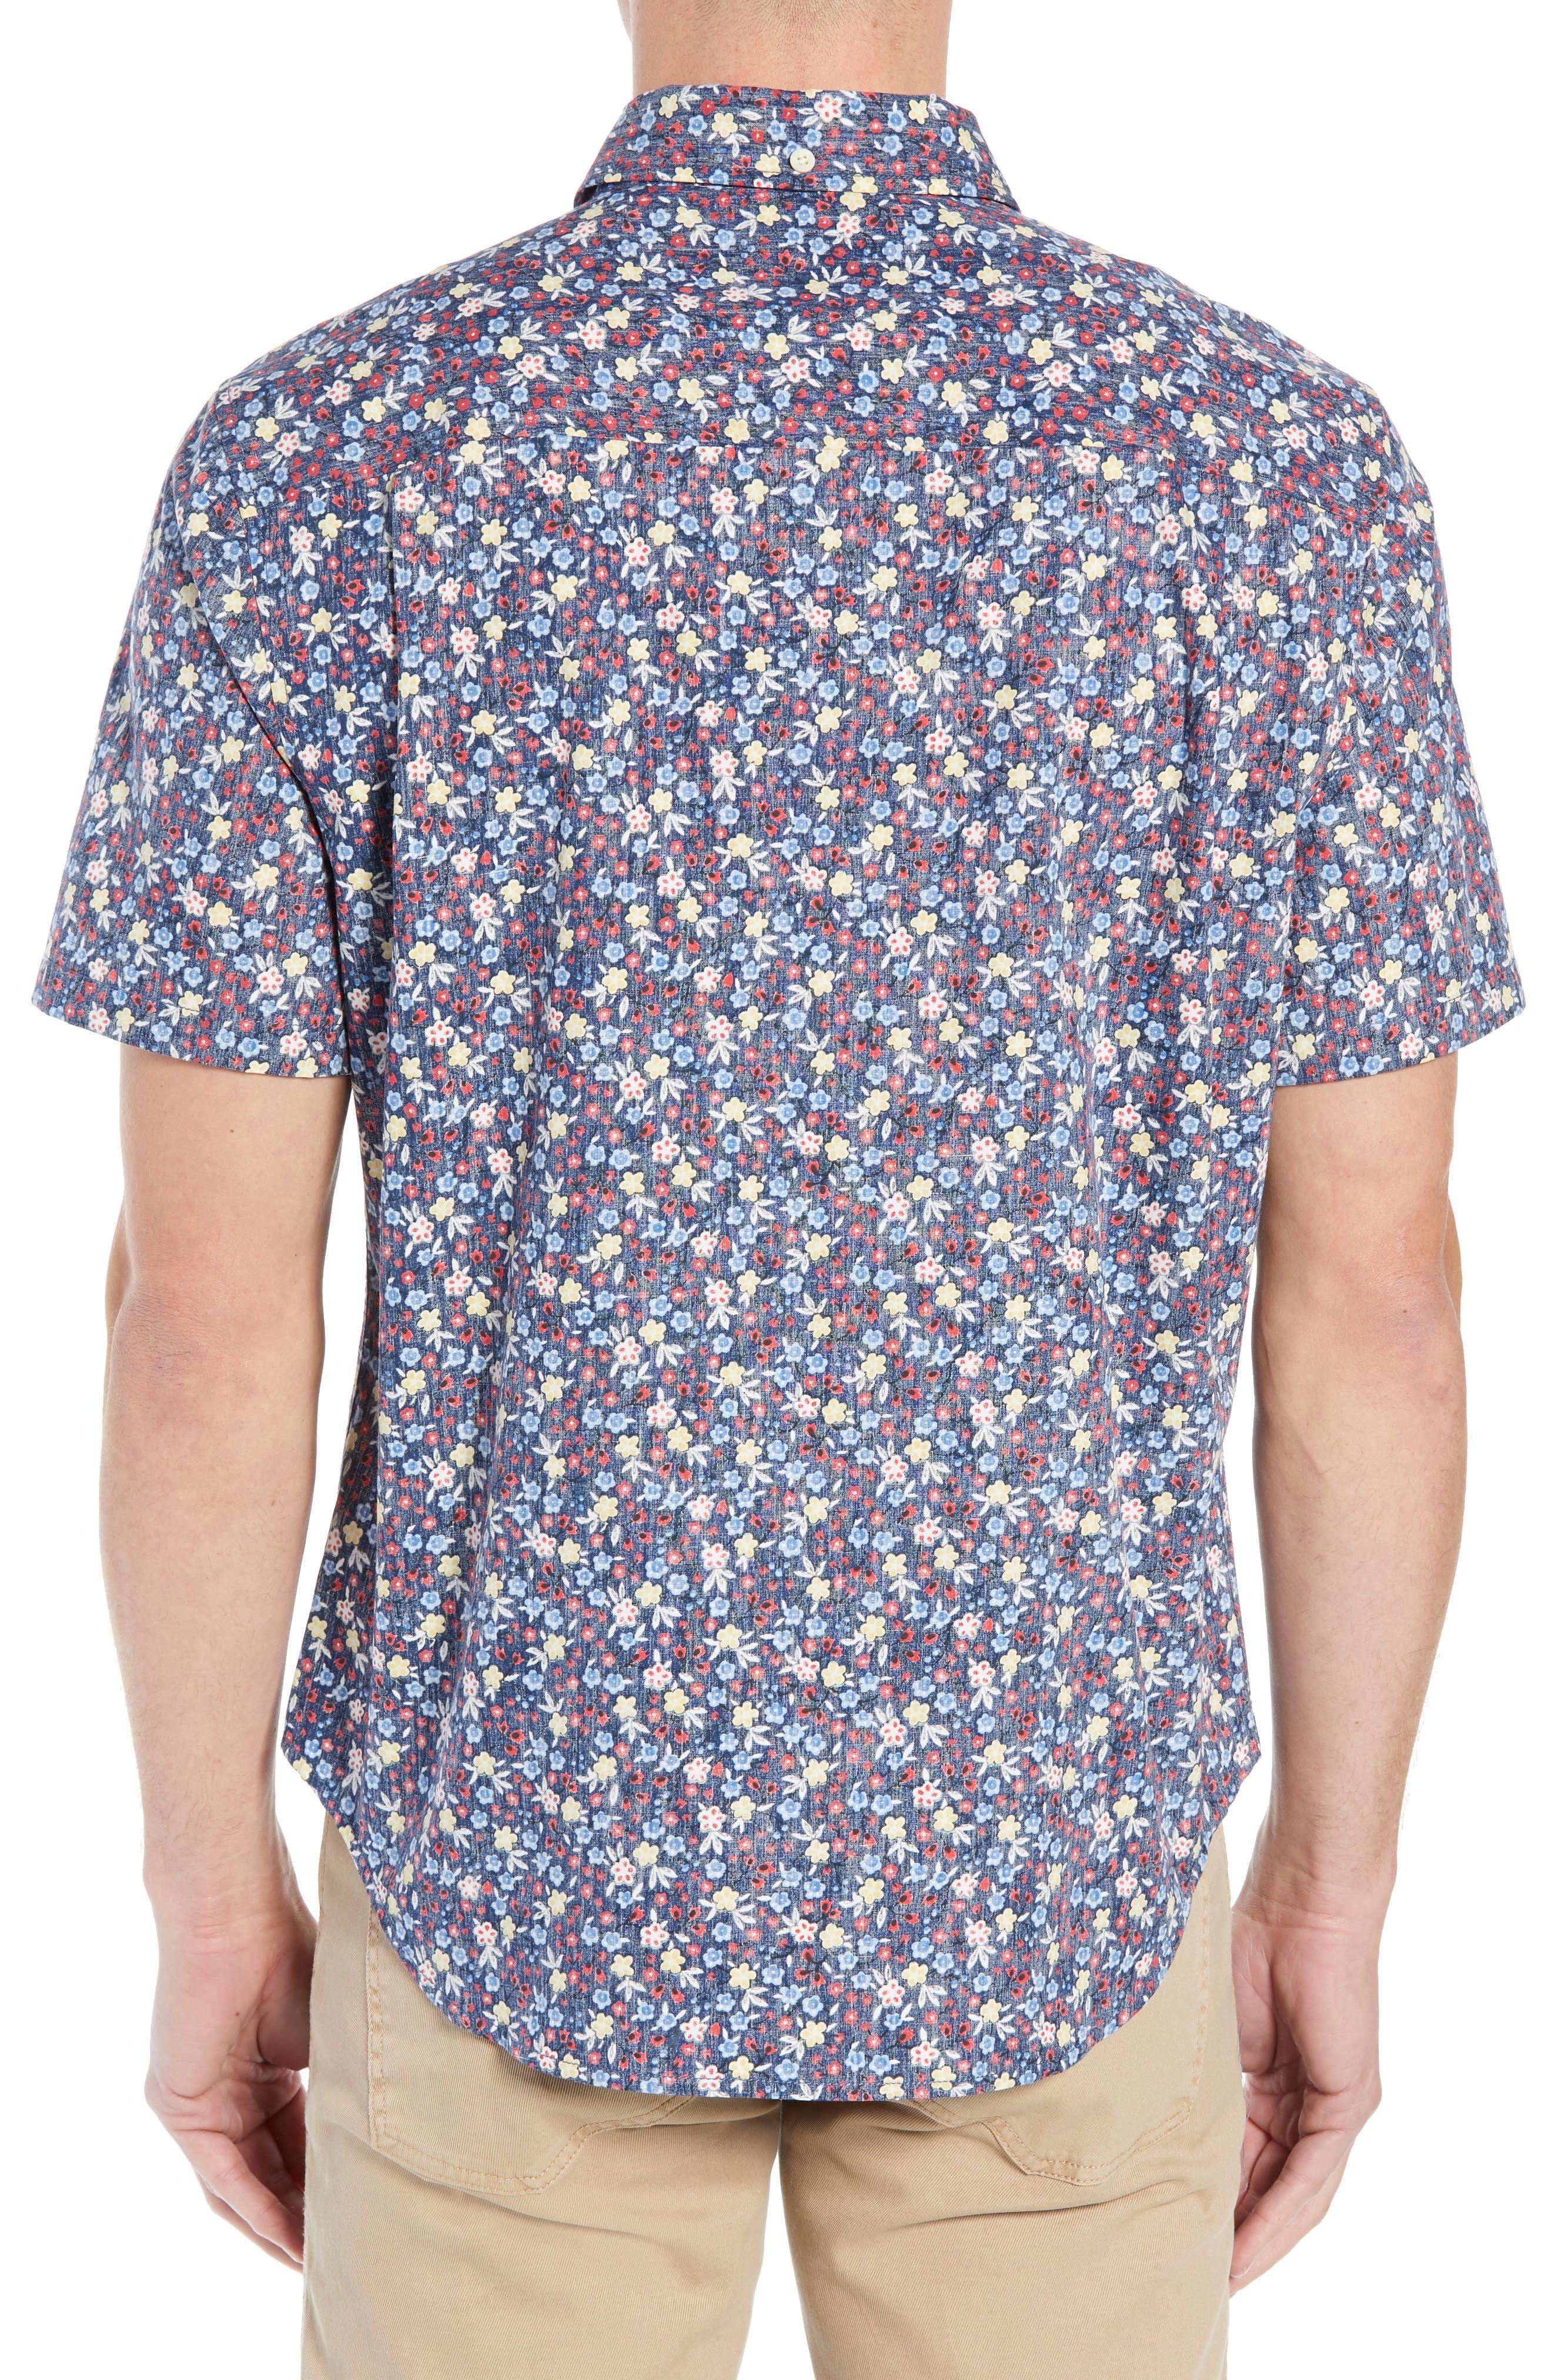 REYN SPOONER, Retro Tailored Fit Sport Shirt, Alternate thumbnail 3, color, MEDIEVAL BLUE